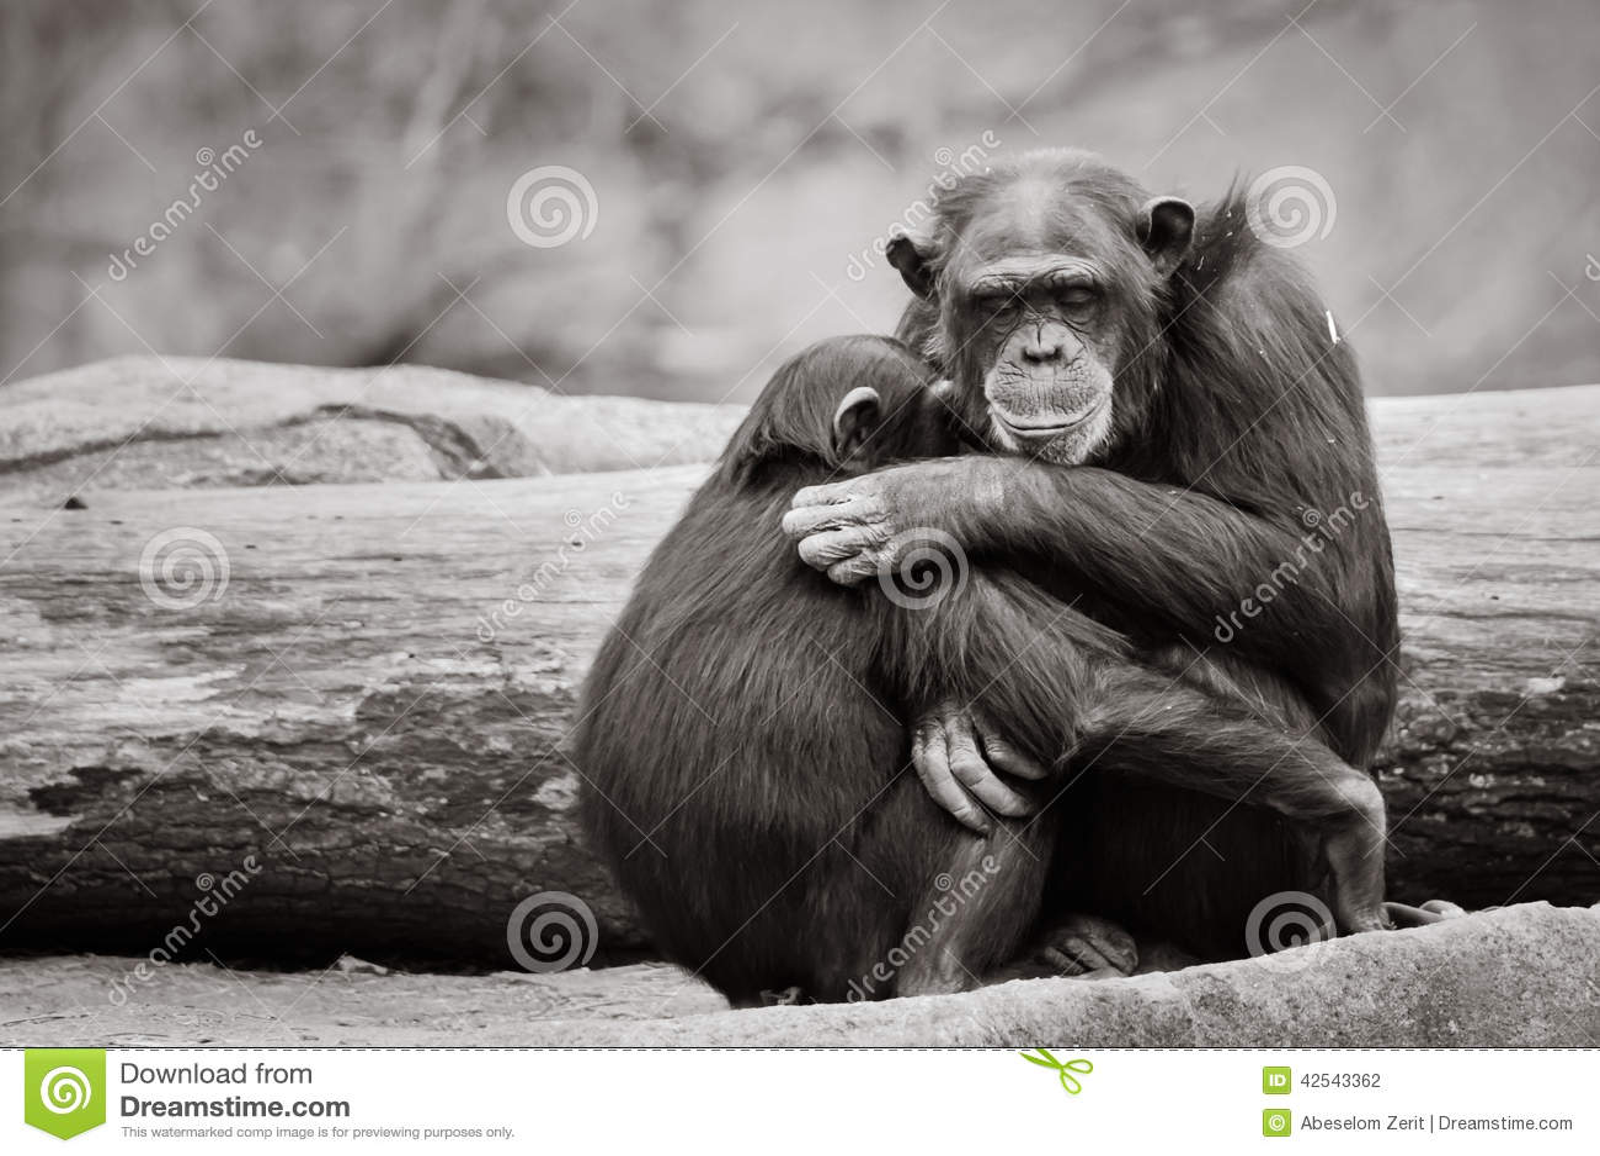 Chimpanzee Hug